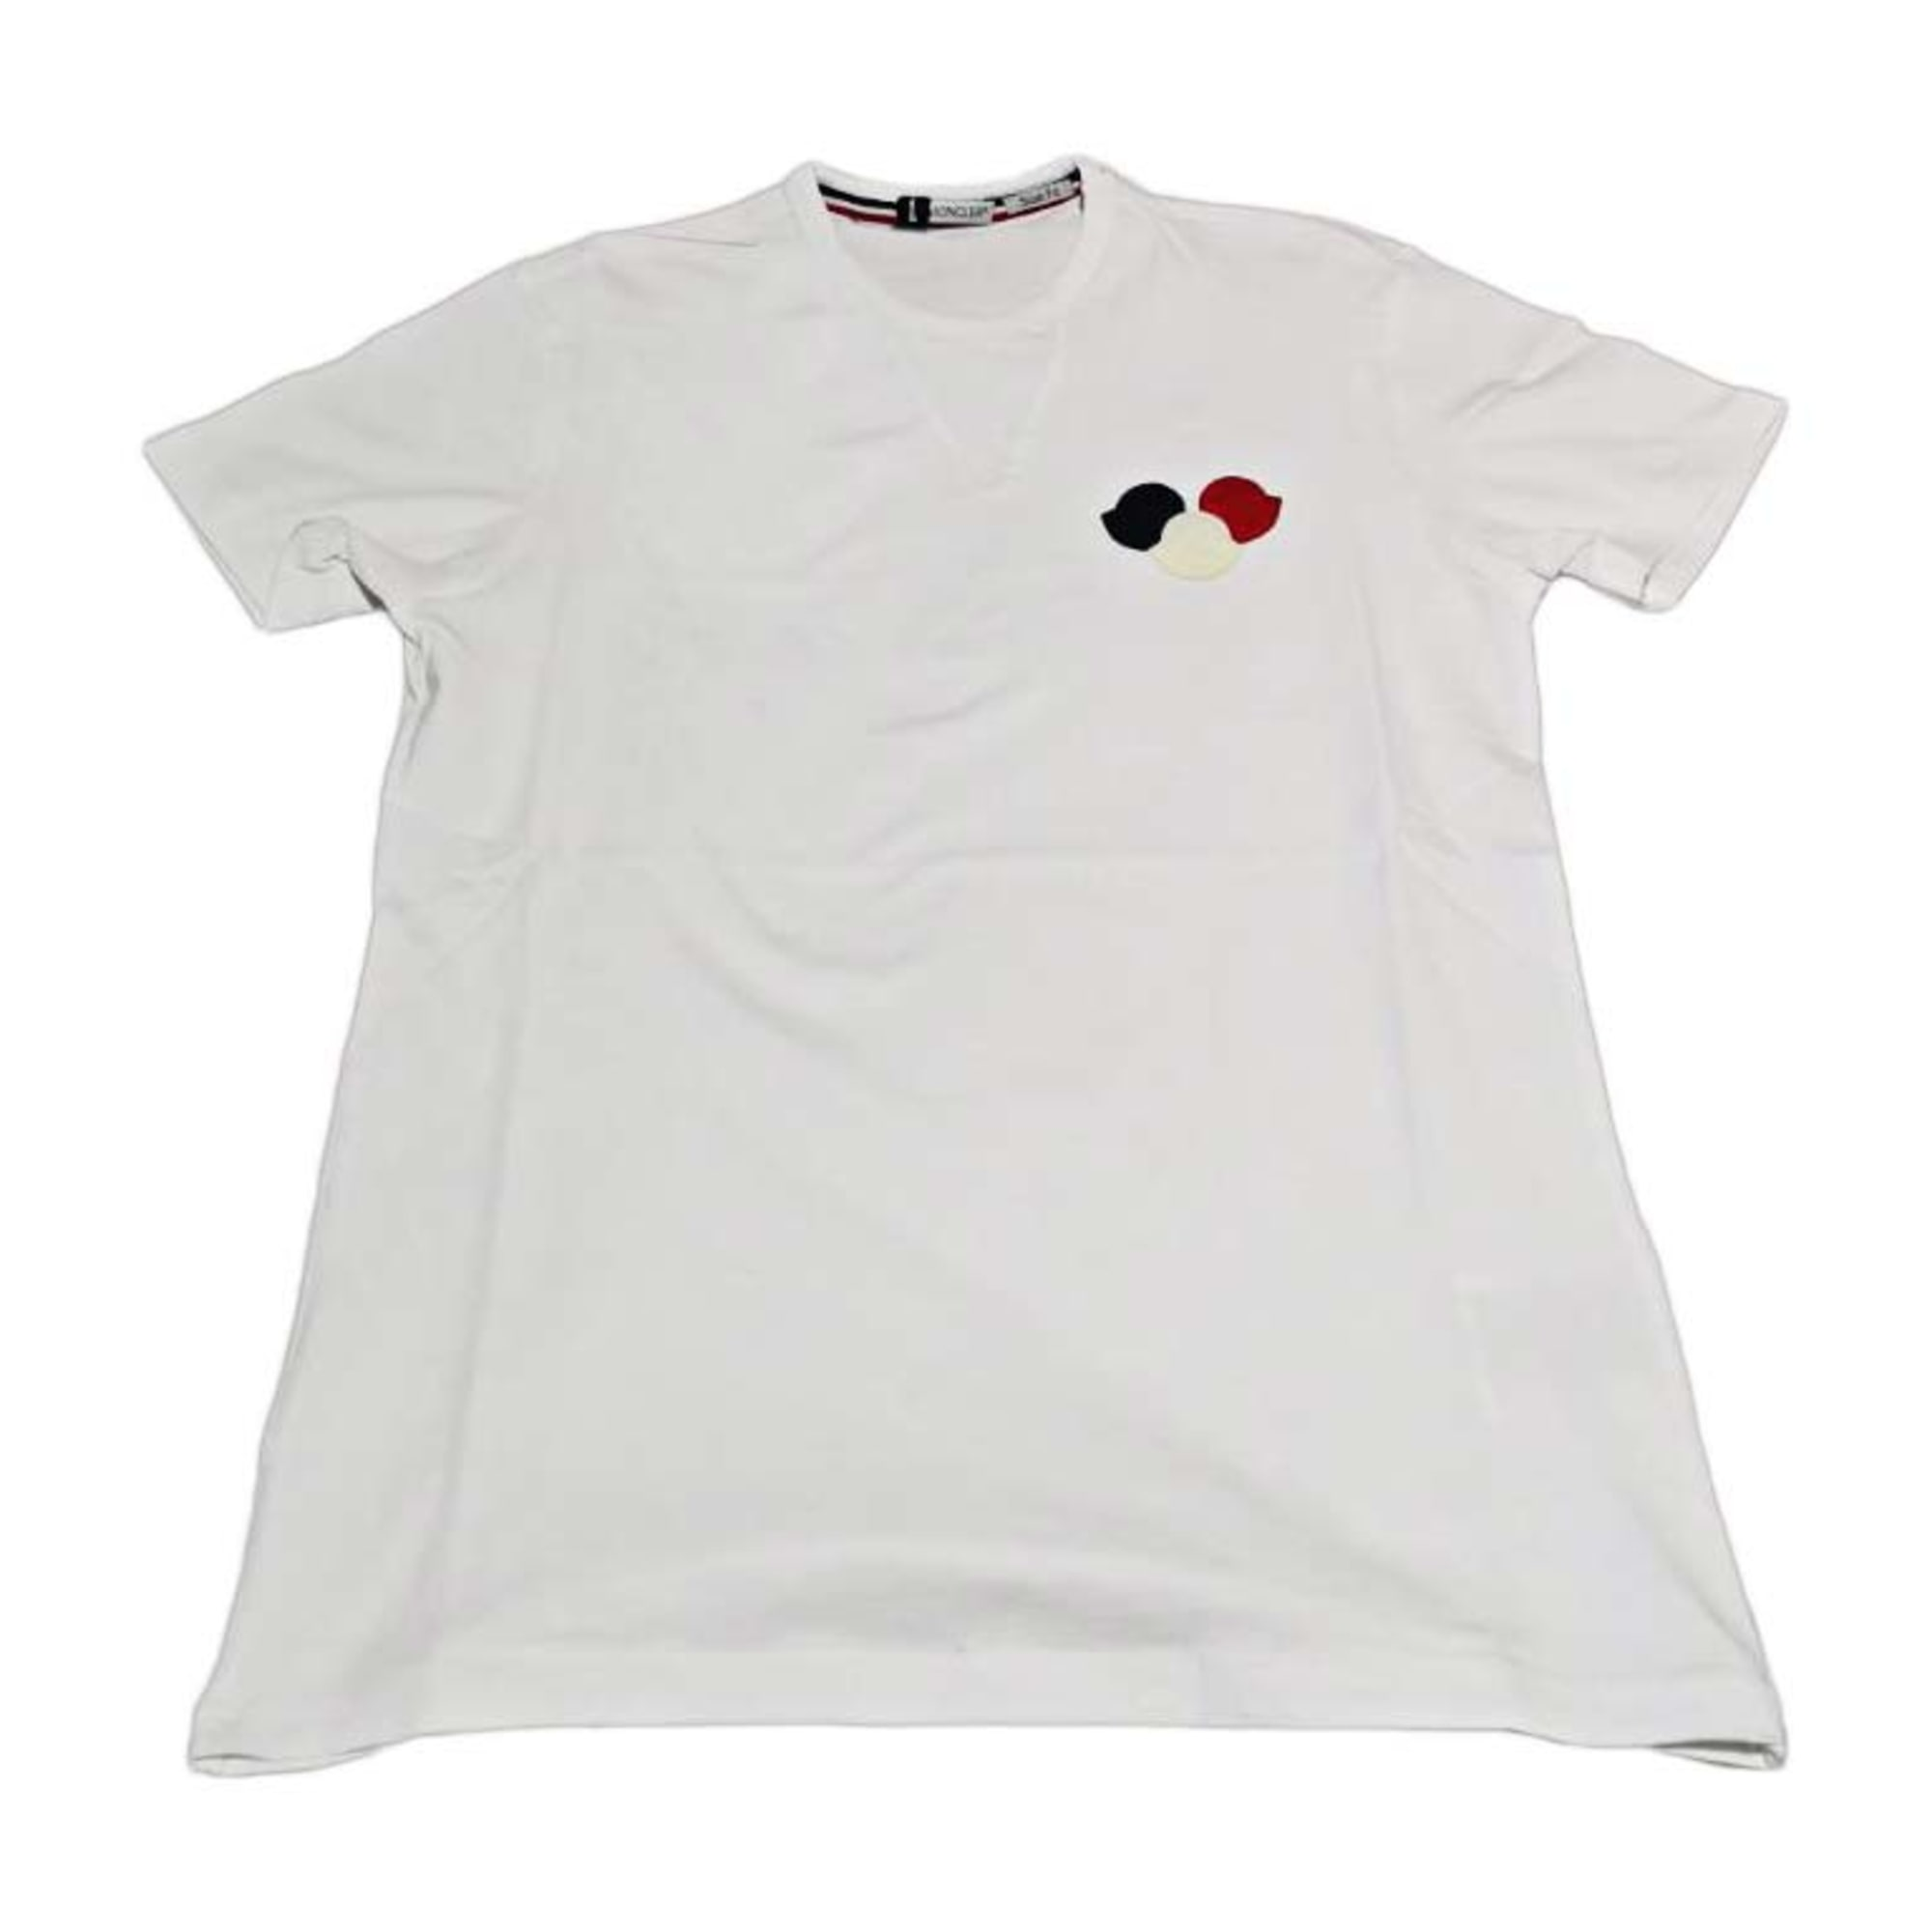 Tee-shirt MONCLER 1 (S) blanc vendu par Maqua - 8144315 9ccfcf01836